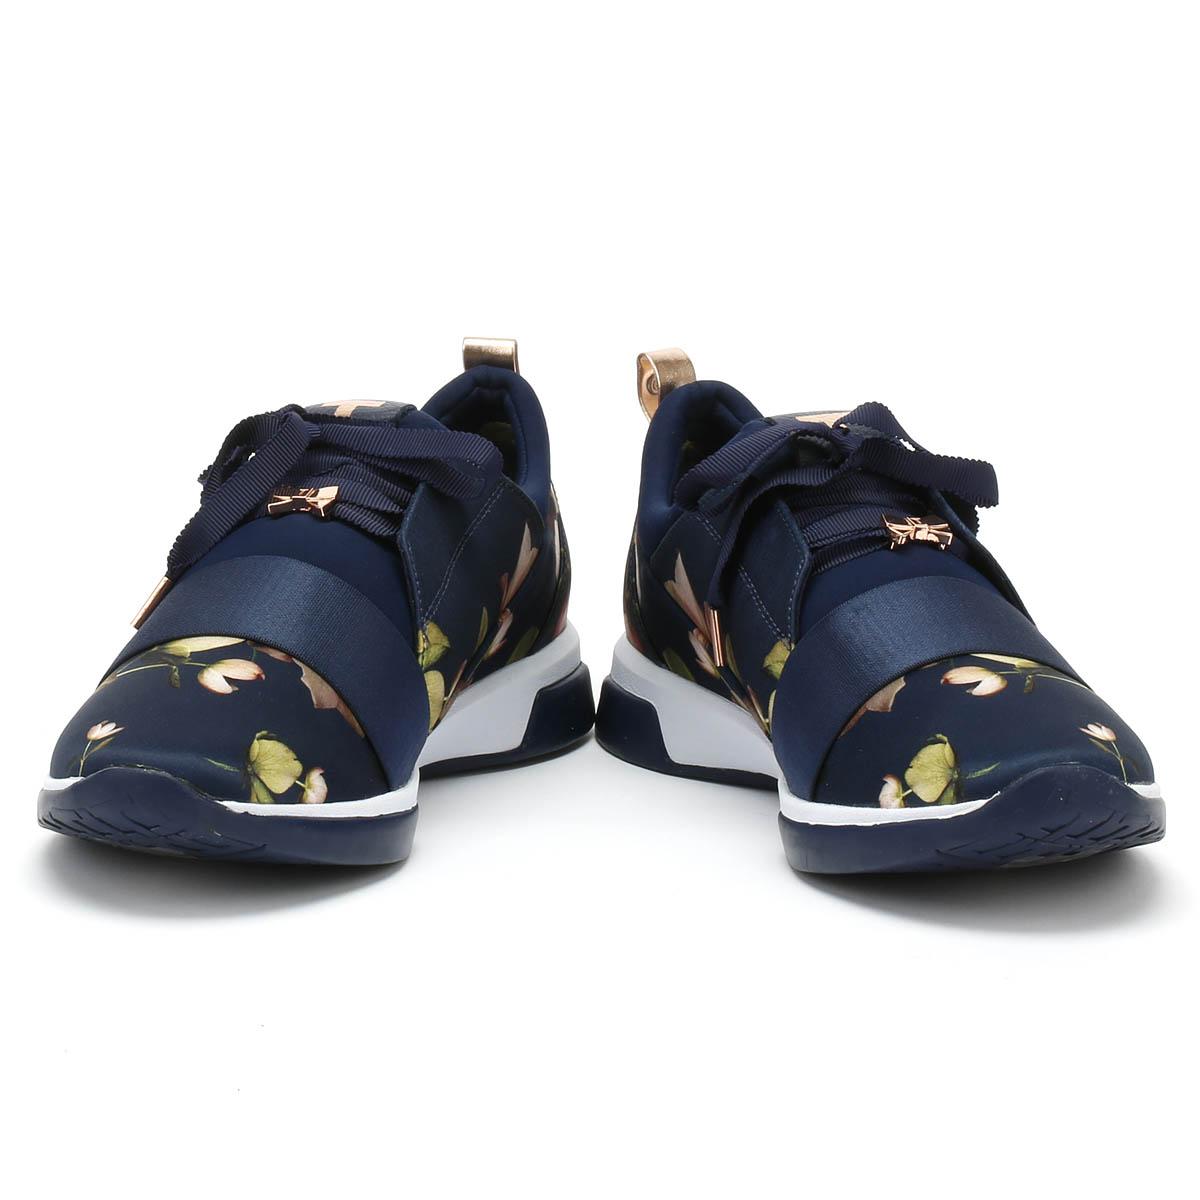 Ted Baker Baker Baker femme Arboretum Navy CEPAP 2 Baskets Femme Sport Chaussures De Loisirs | Durable  67c778